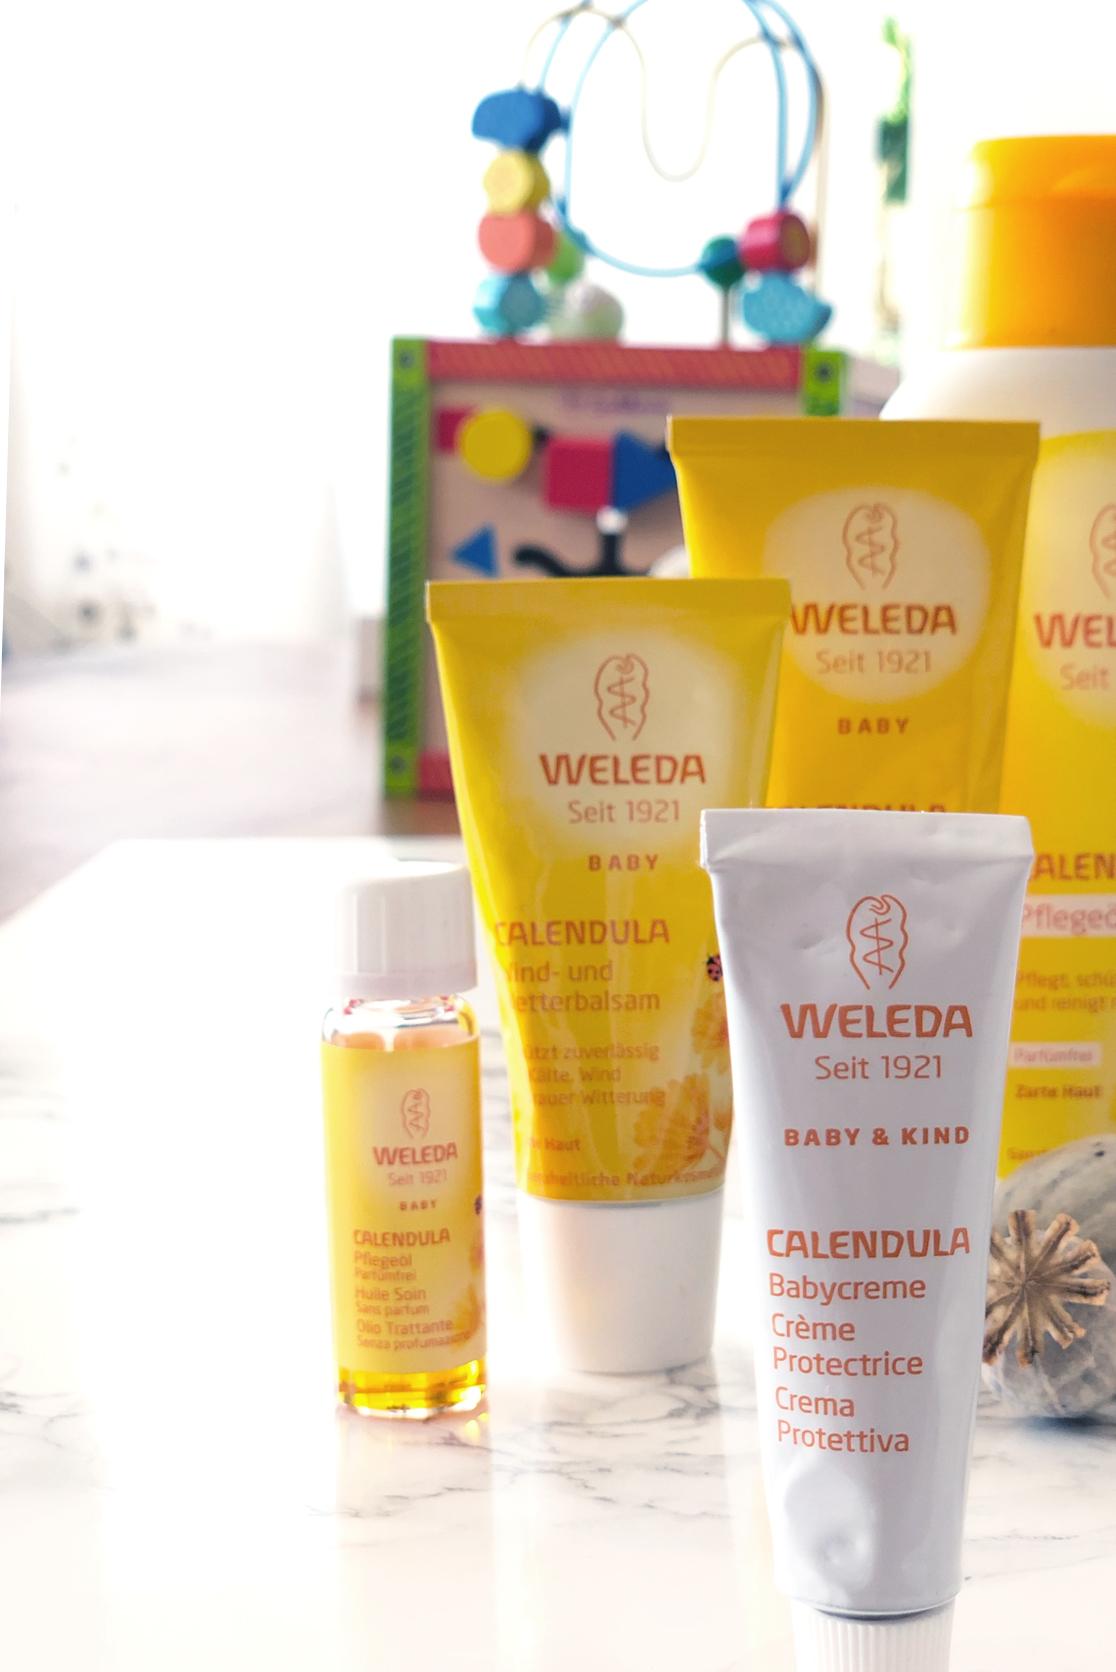 Vegane Kosmetik - Weleda Calendula Pflegeprodukte für Mama und Baby